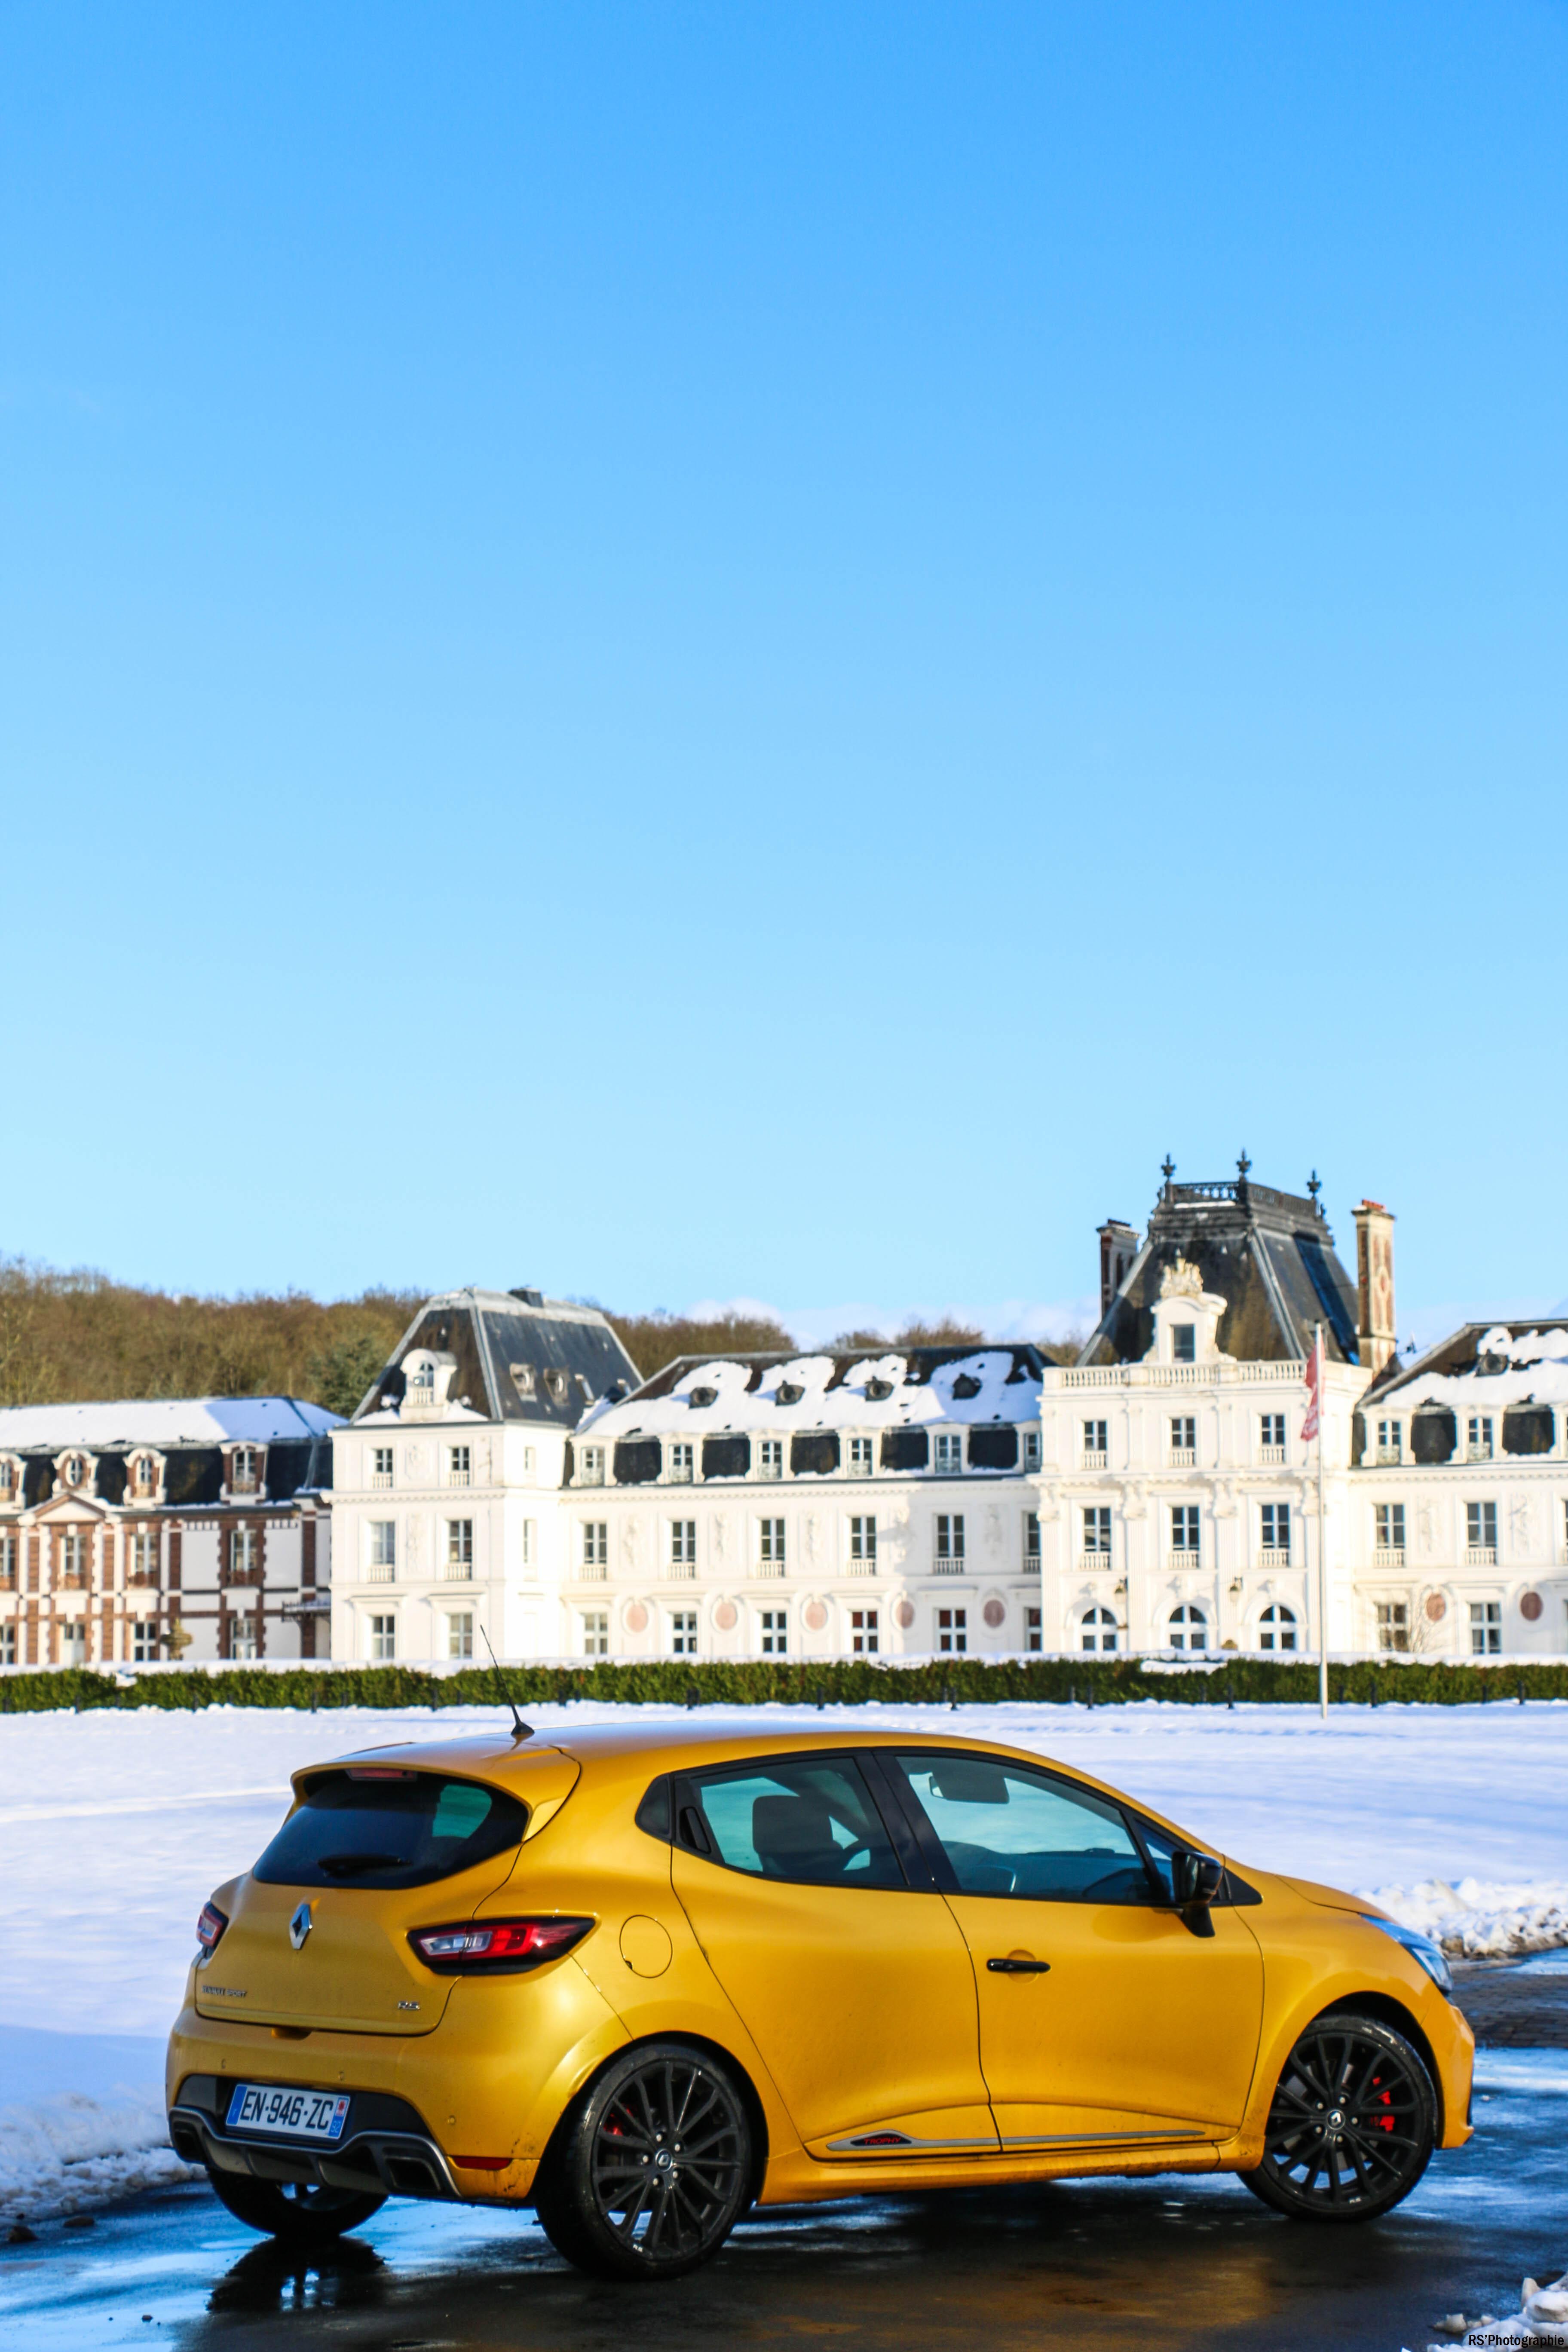 RenaultclioIVRSTrophy10-renault-clio-RS-trophy-arriere-rear-Arnaud Demasier-RSPhotographie